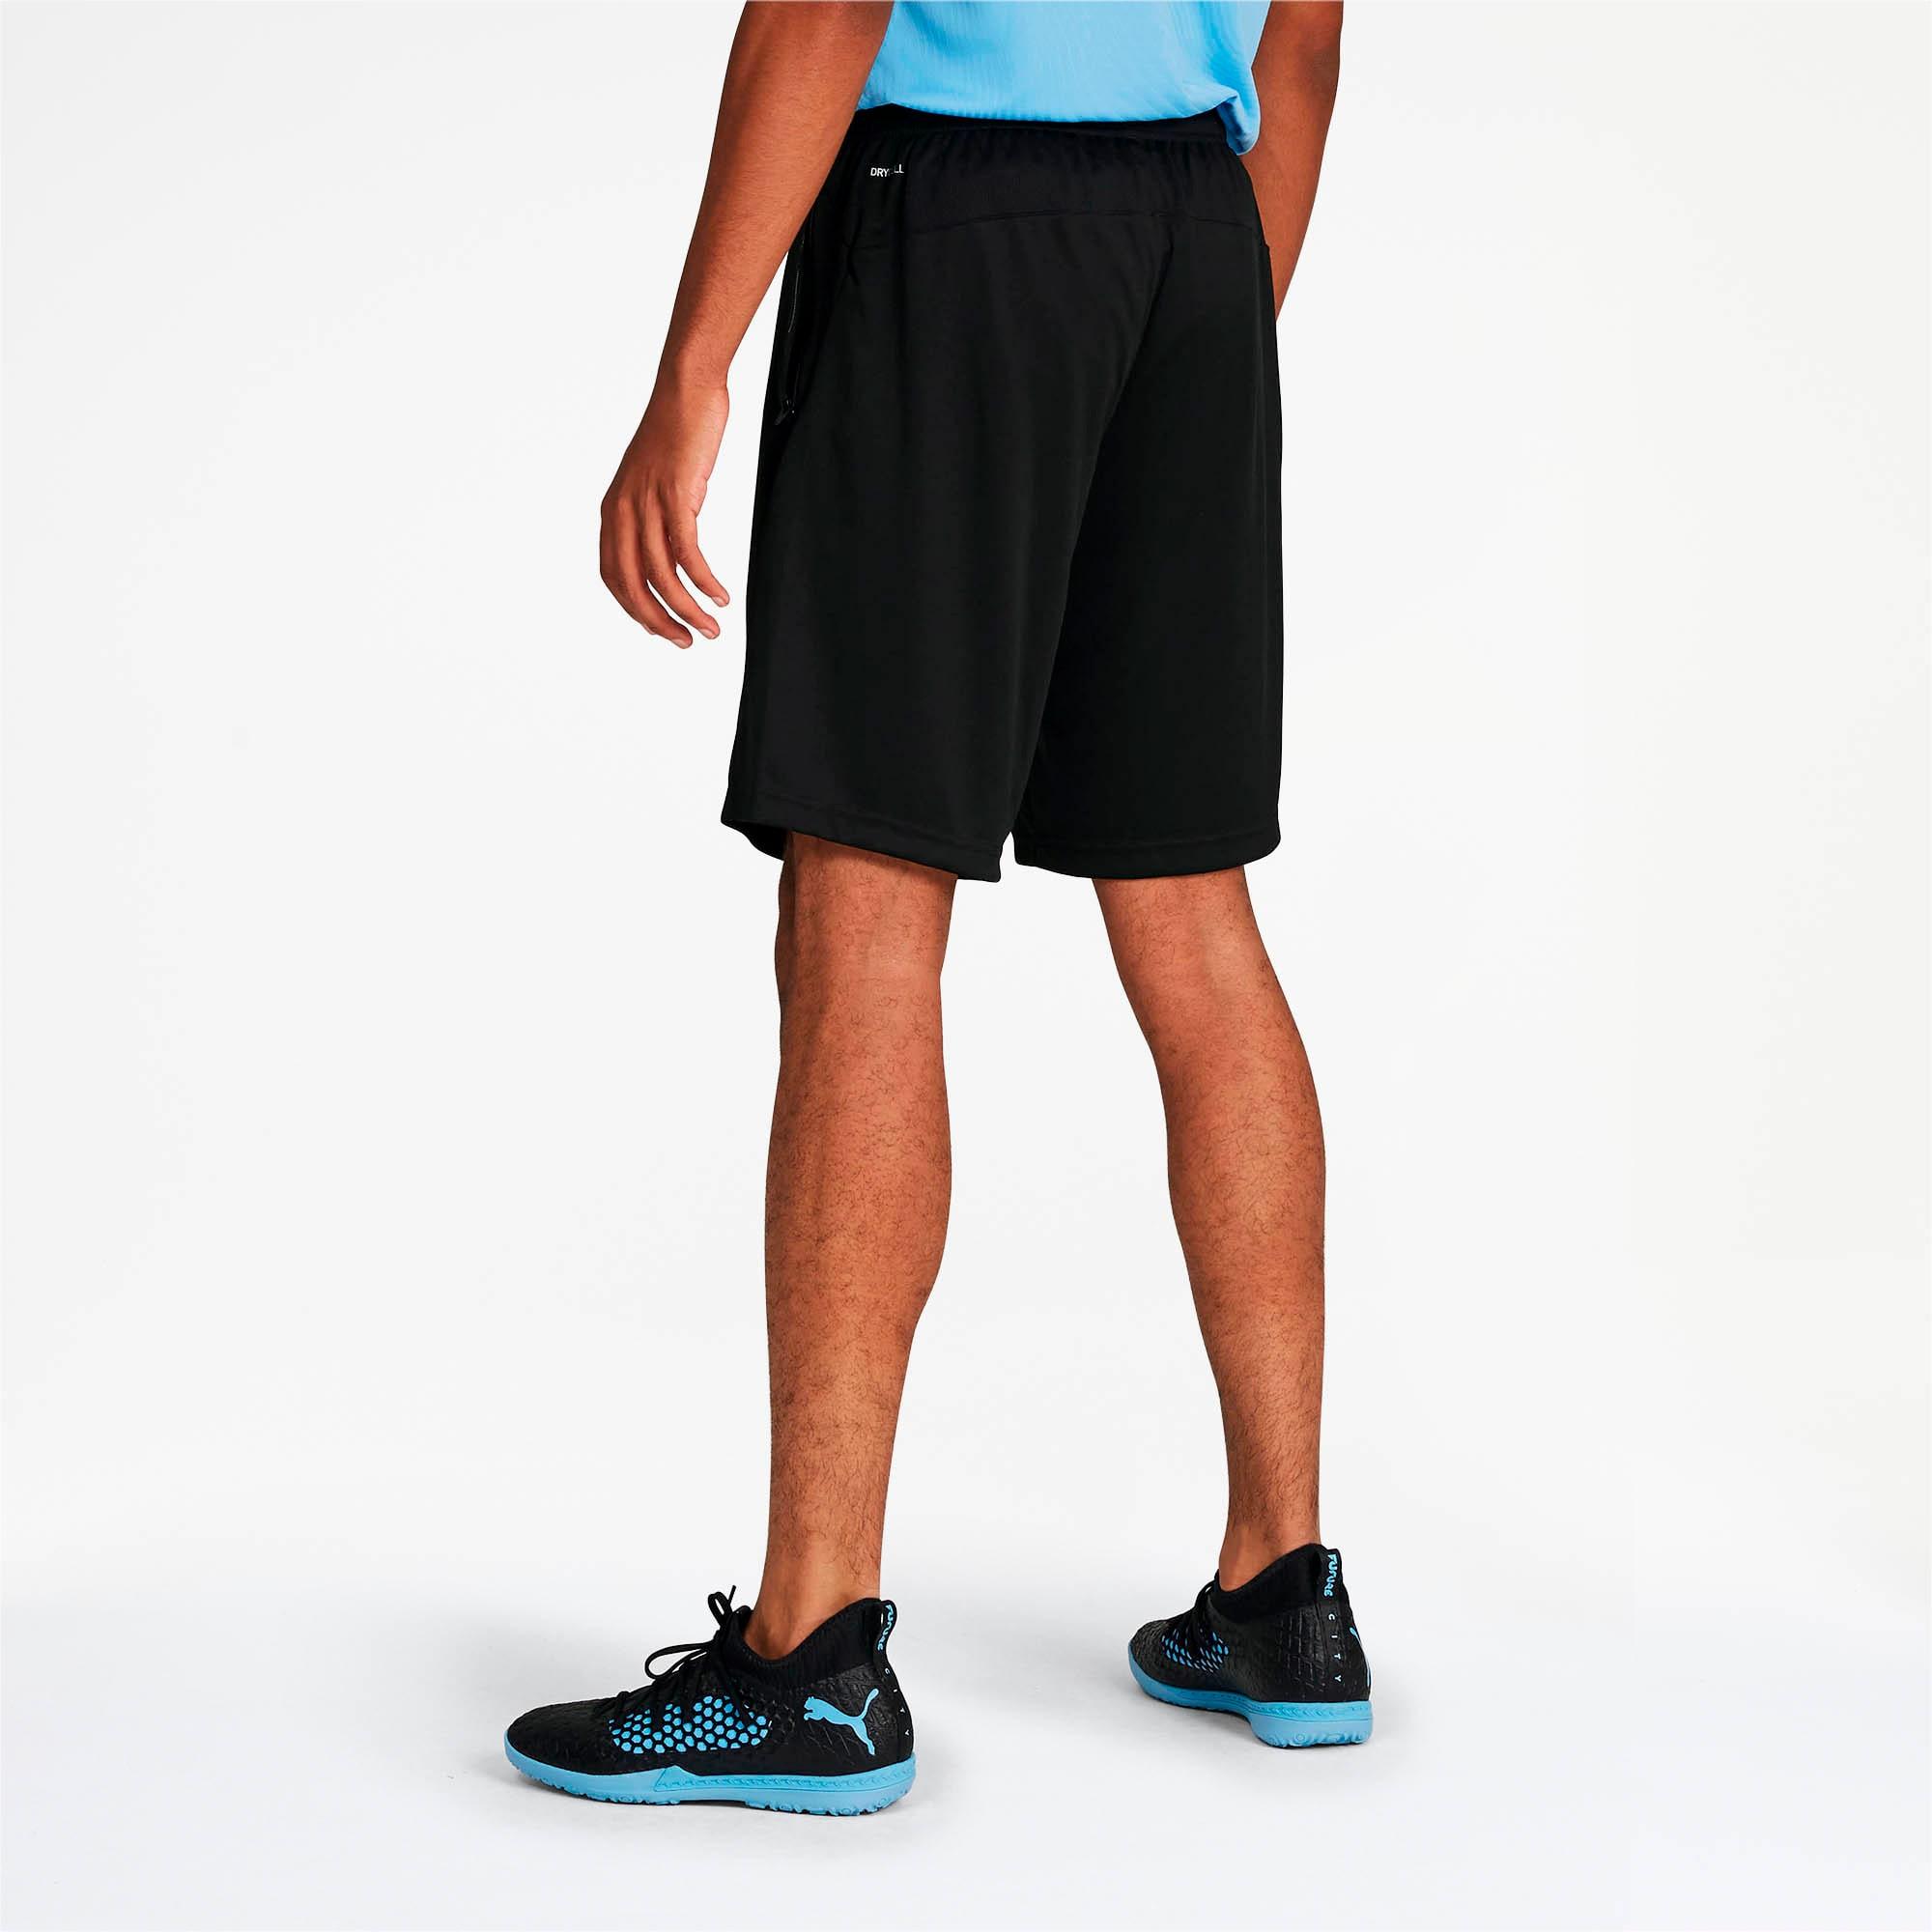 Thumbnail 2 of Manchester City FC Men's Training Shorts, Puma Black-Team Light Blue, medium